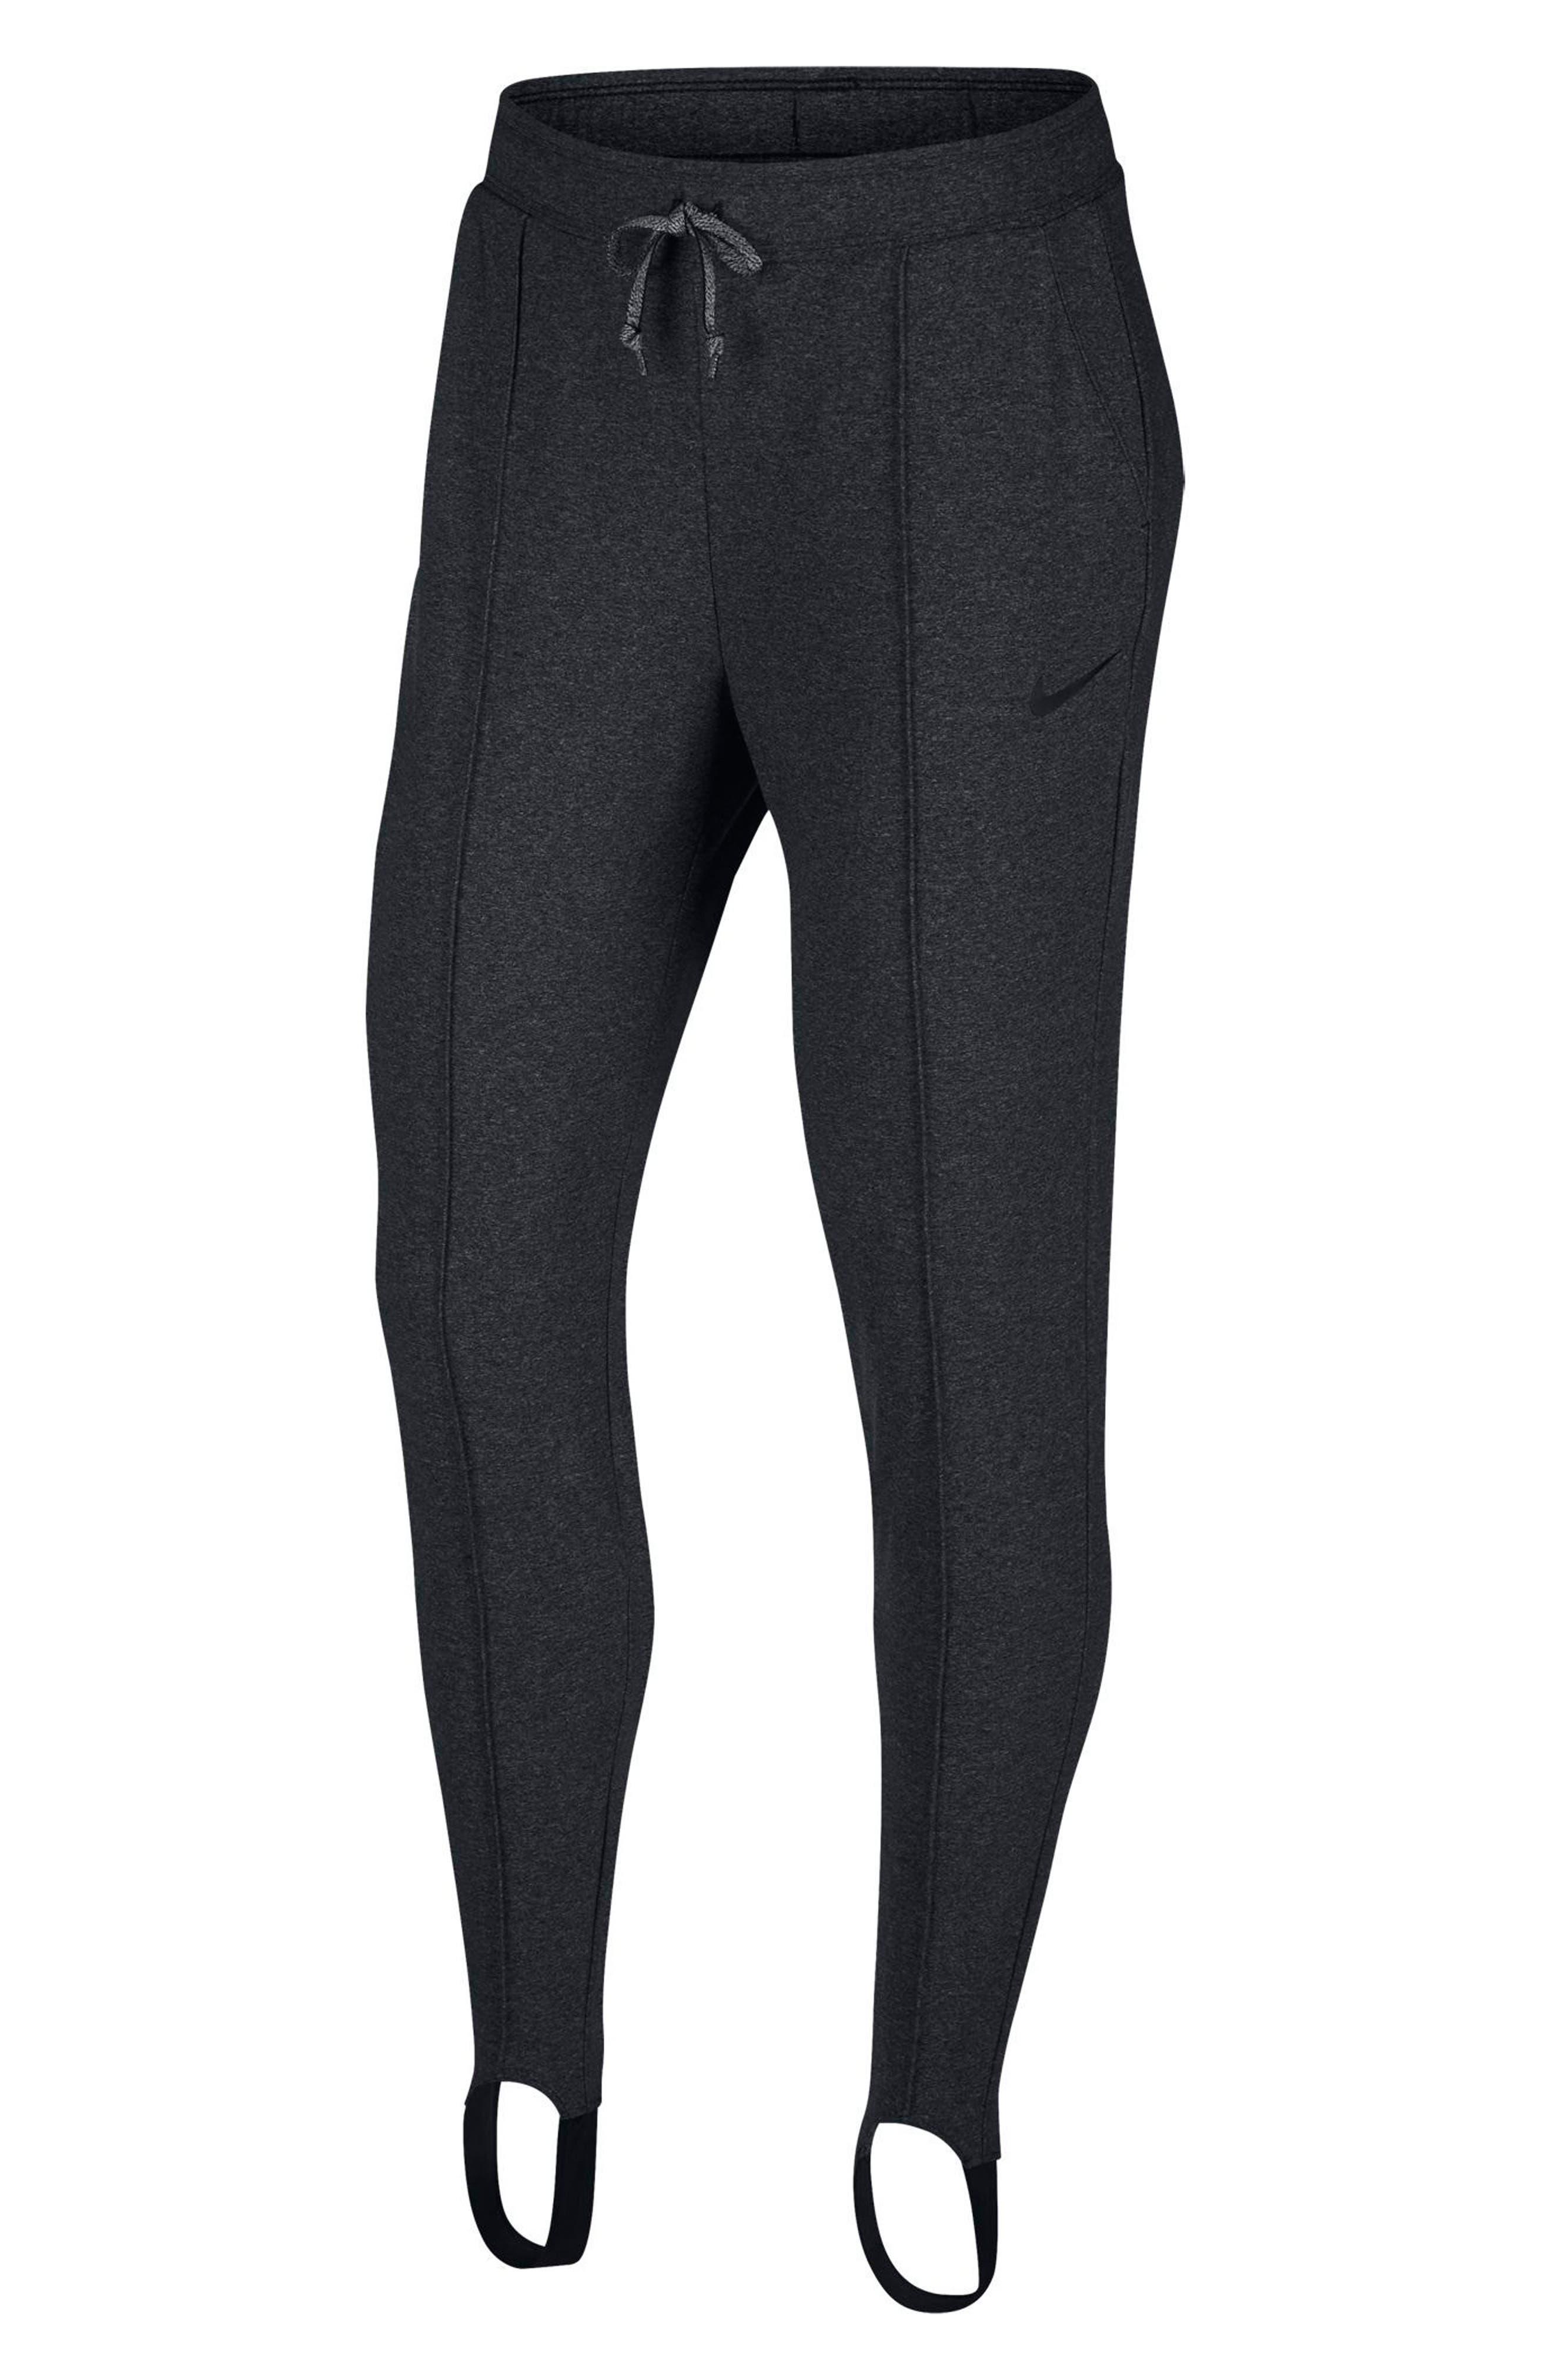 Dry Training Pants,                         Main,                         color, Black/ Heather/ Black